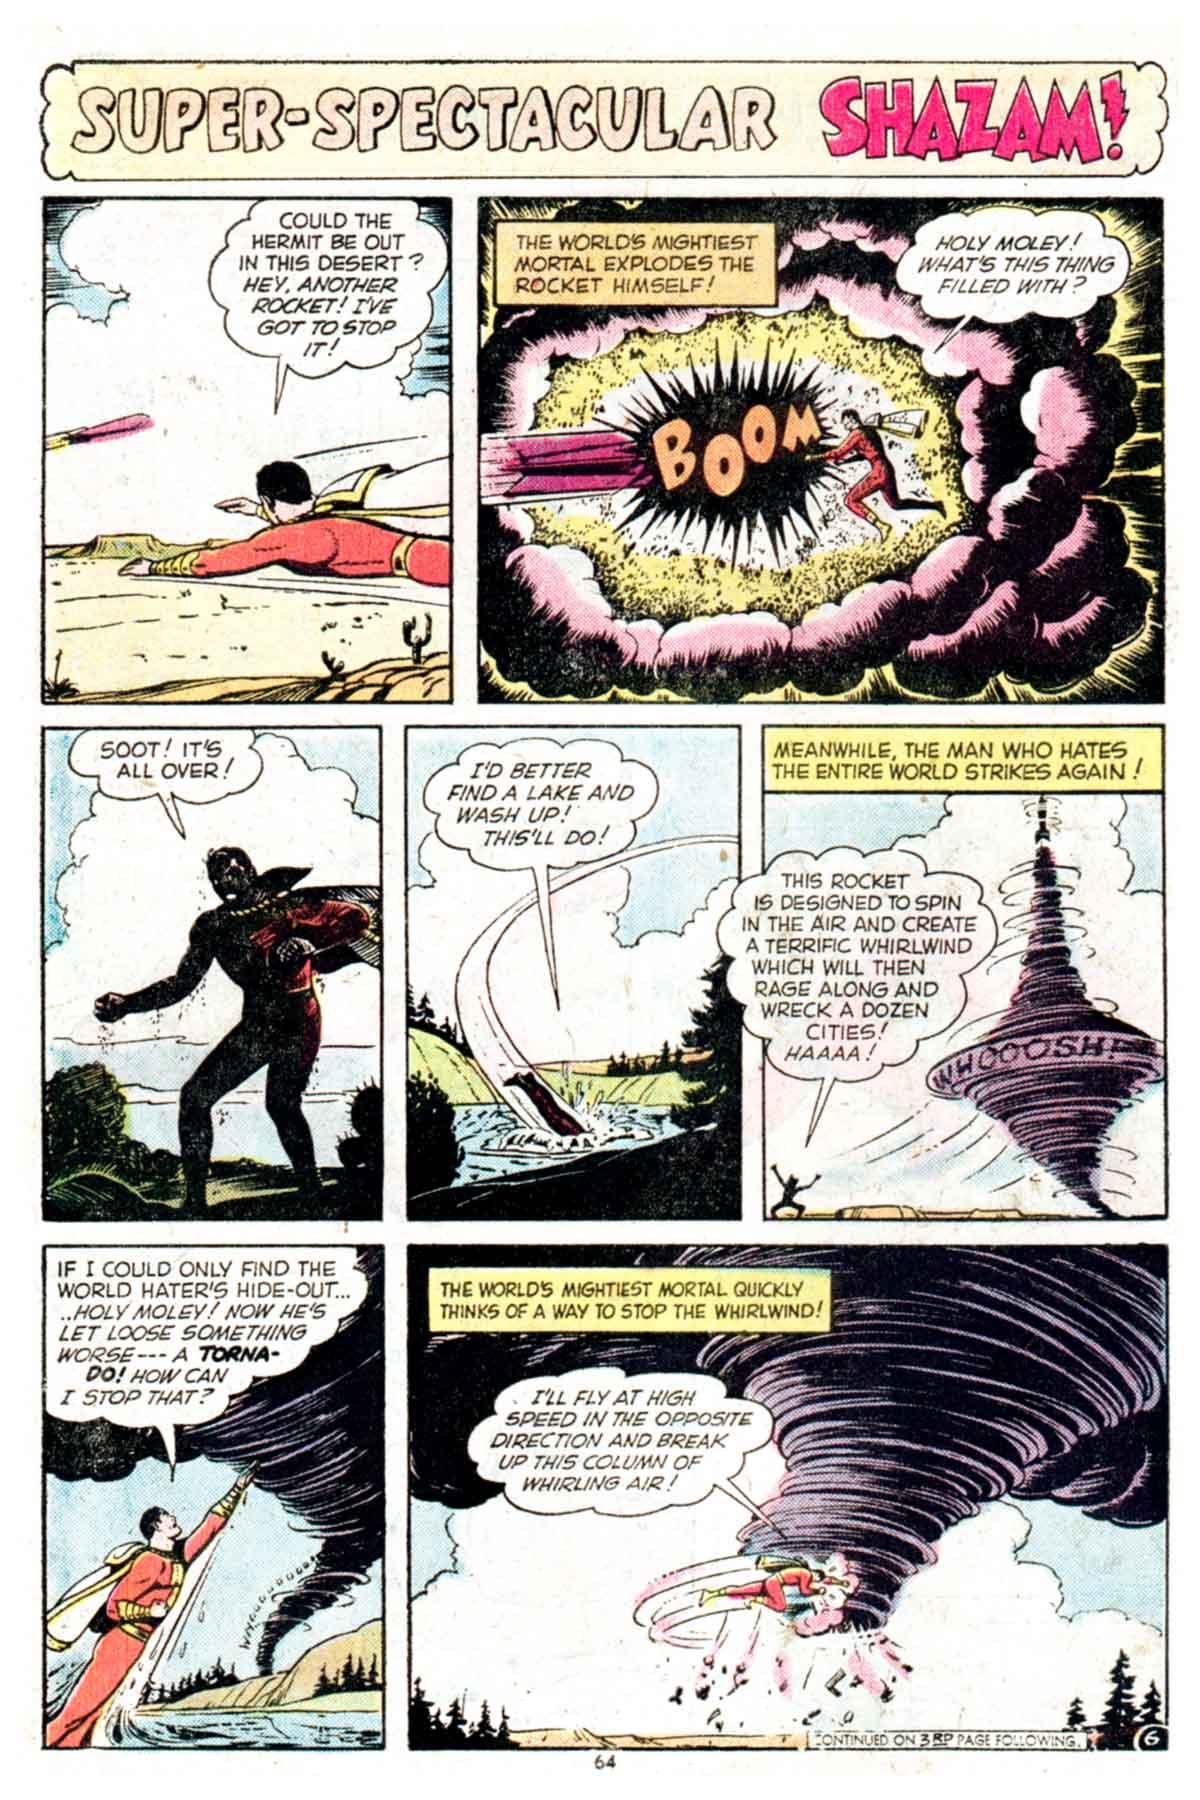 Read online Shazam! (1973) comic -  Issue #16 - 64